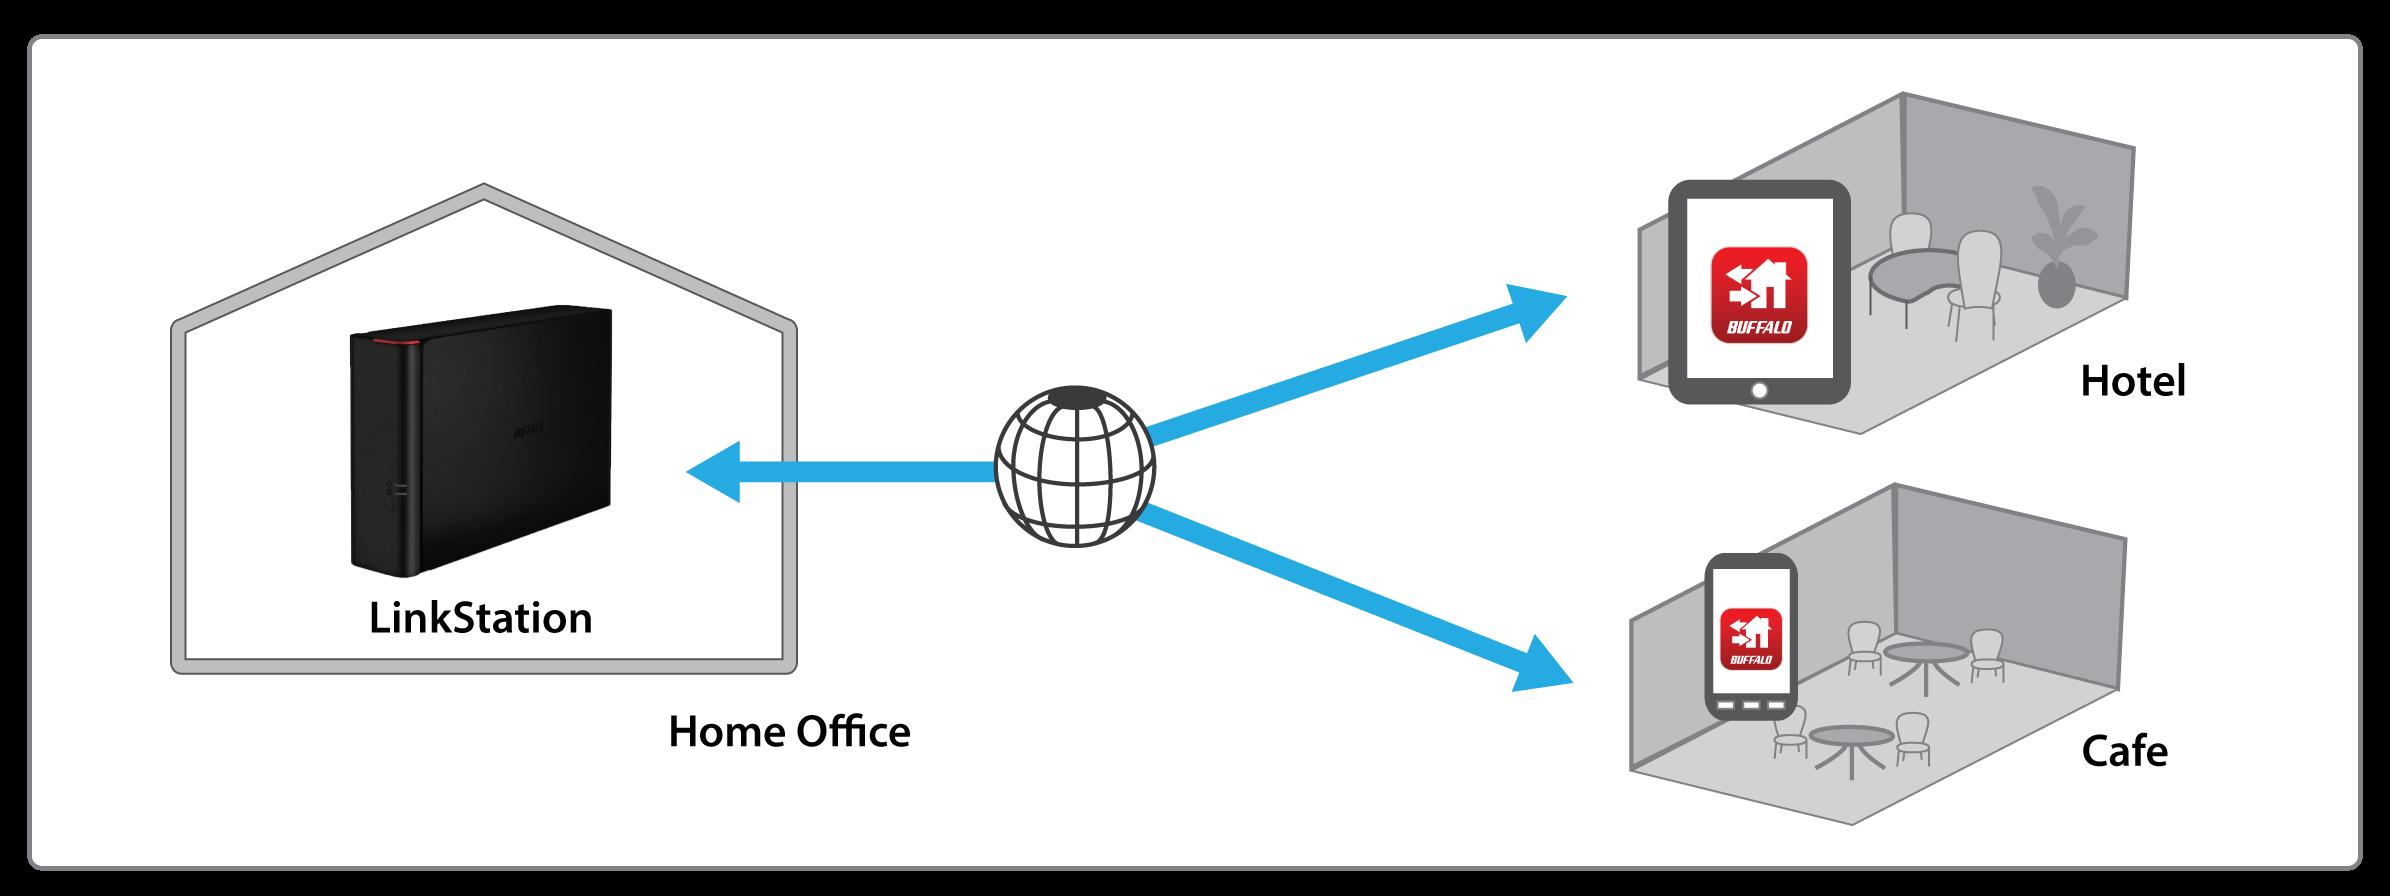 Linkstation 400 Series Buffalo Americas Diagram Of Home Network Free Personal Cloud Service